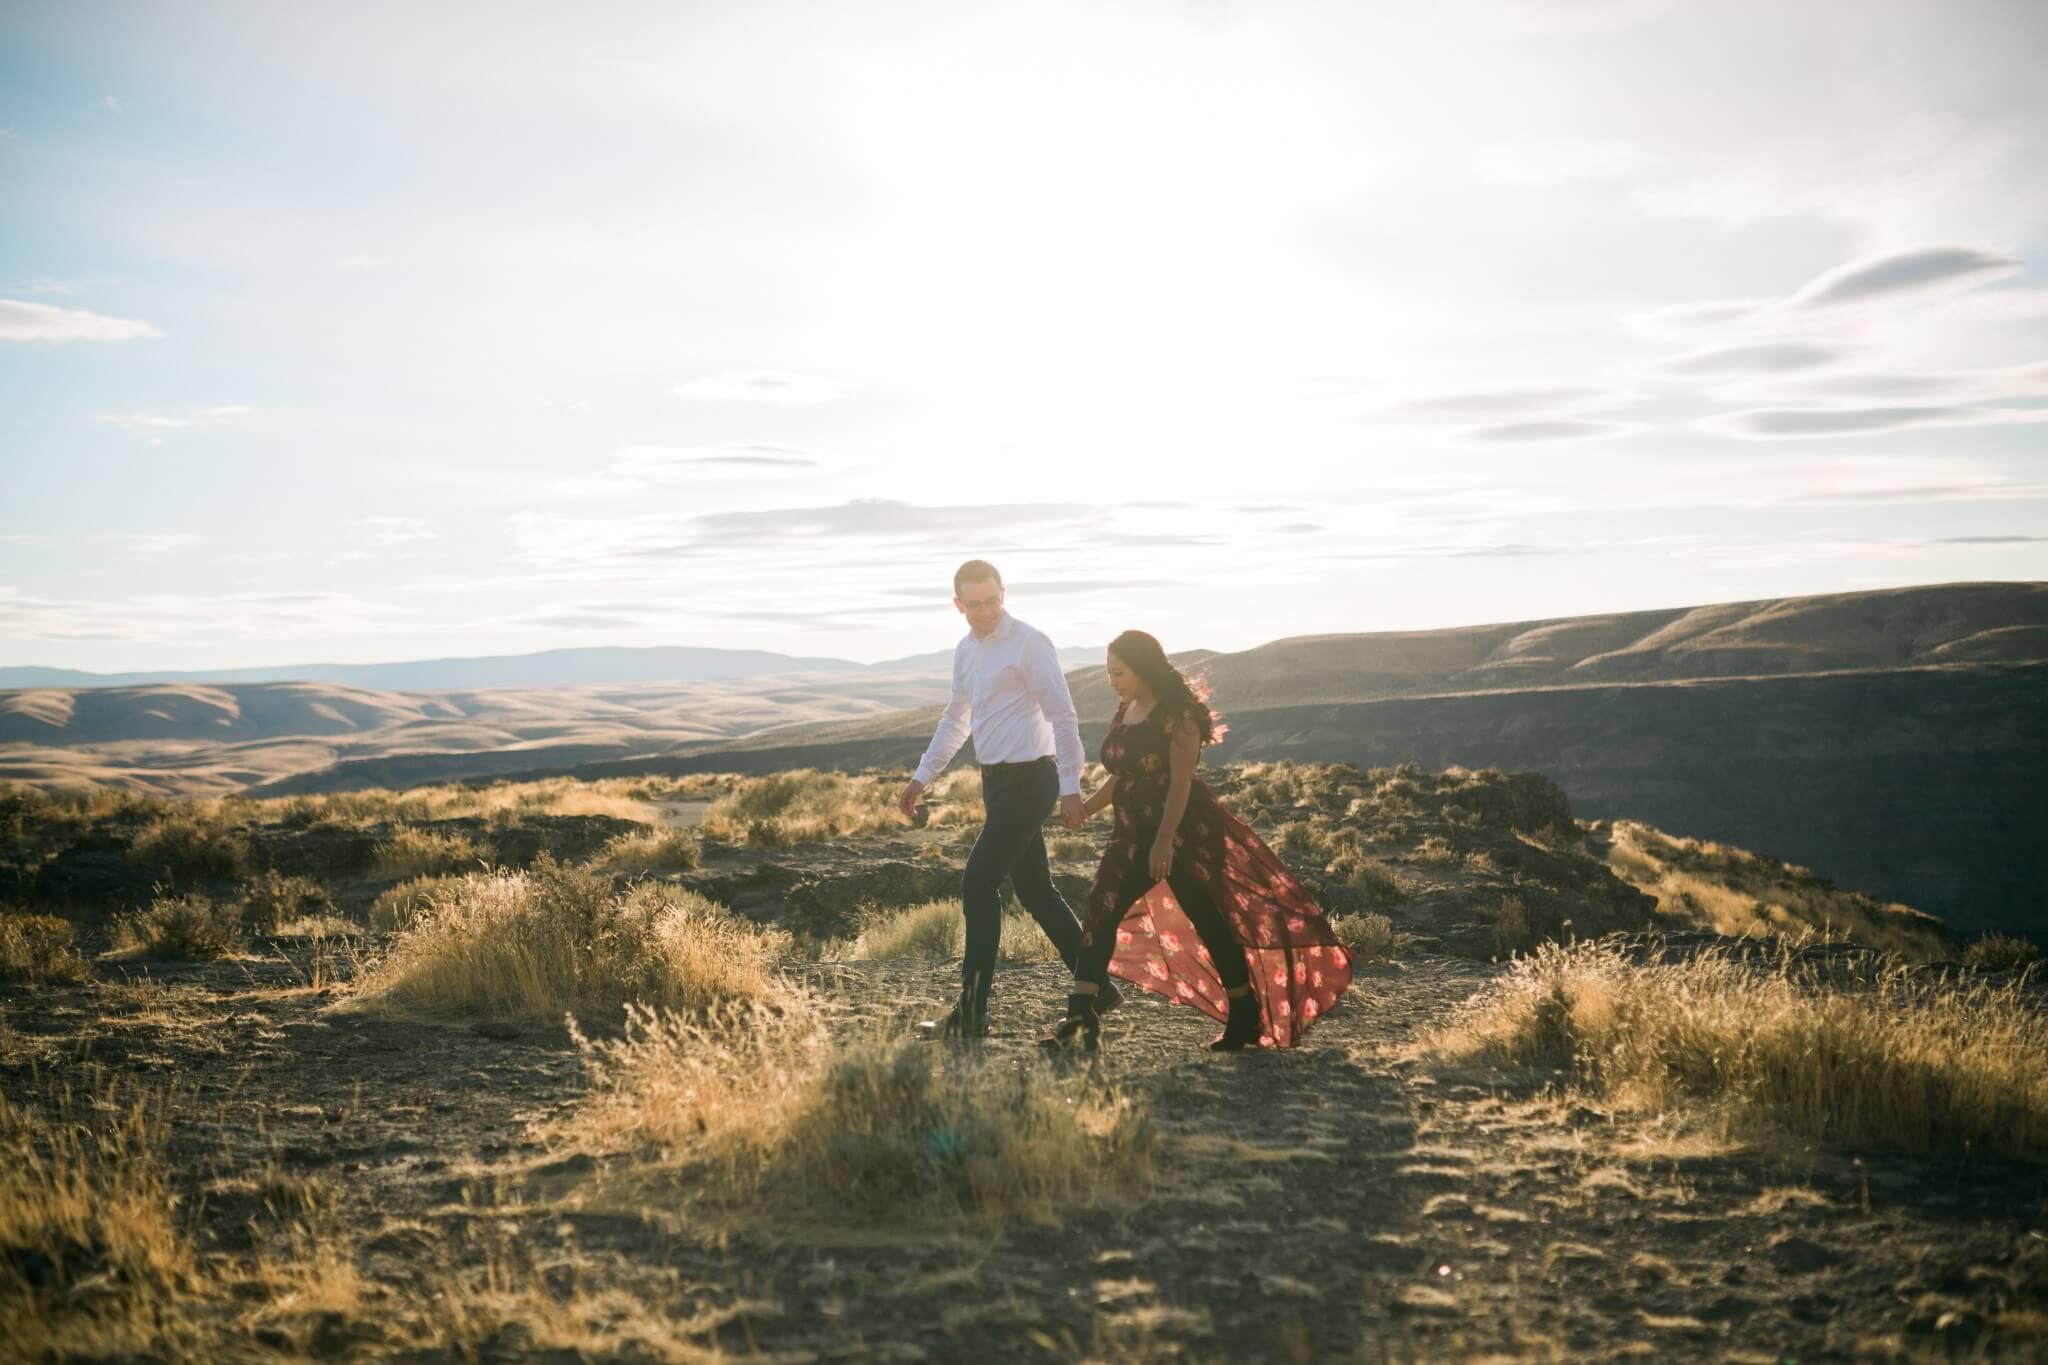 Lesly & Michael Vantage Engagement by Bill Weisgerber Spokane Photographer (16 of 71).jpg